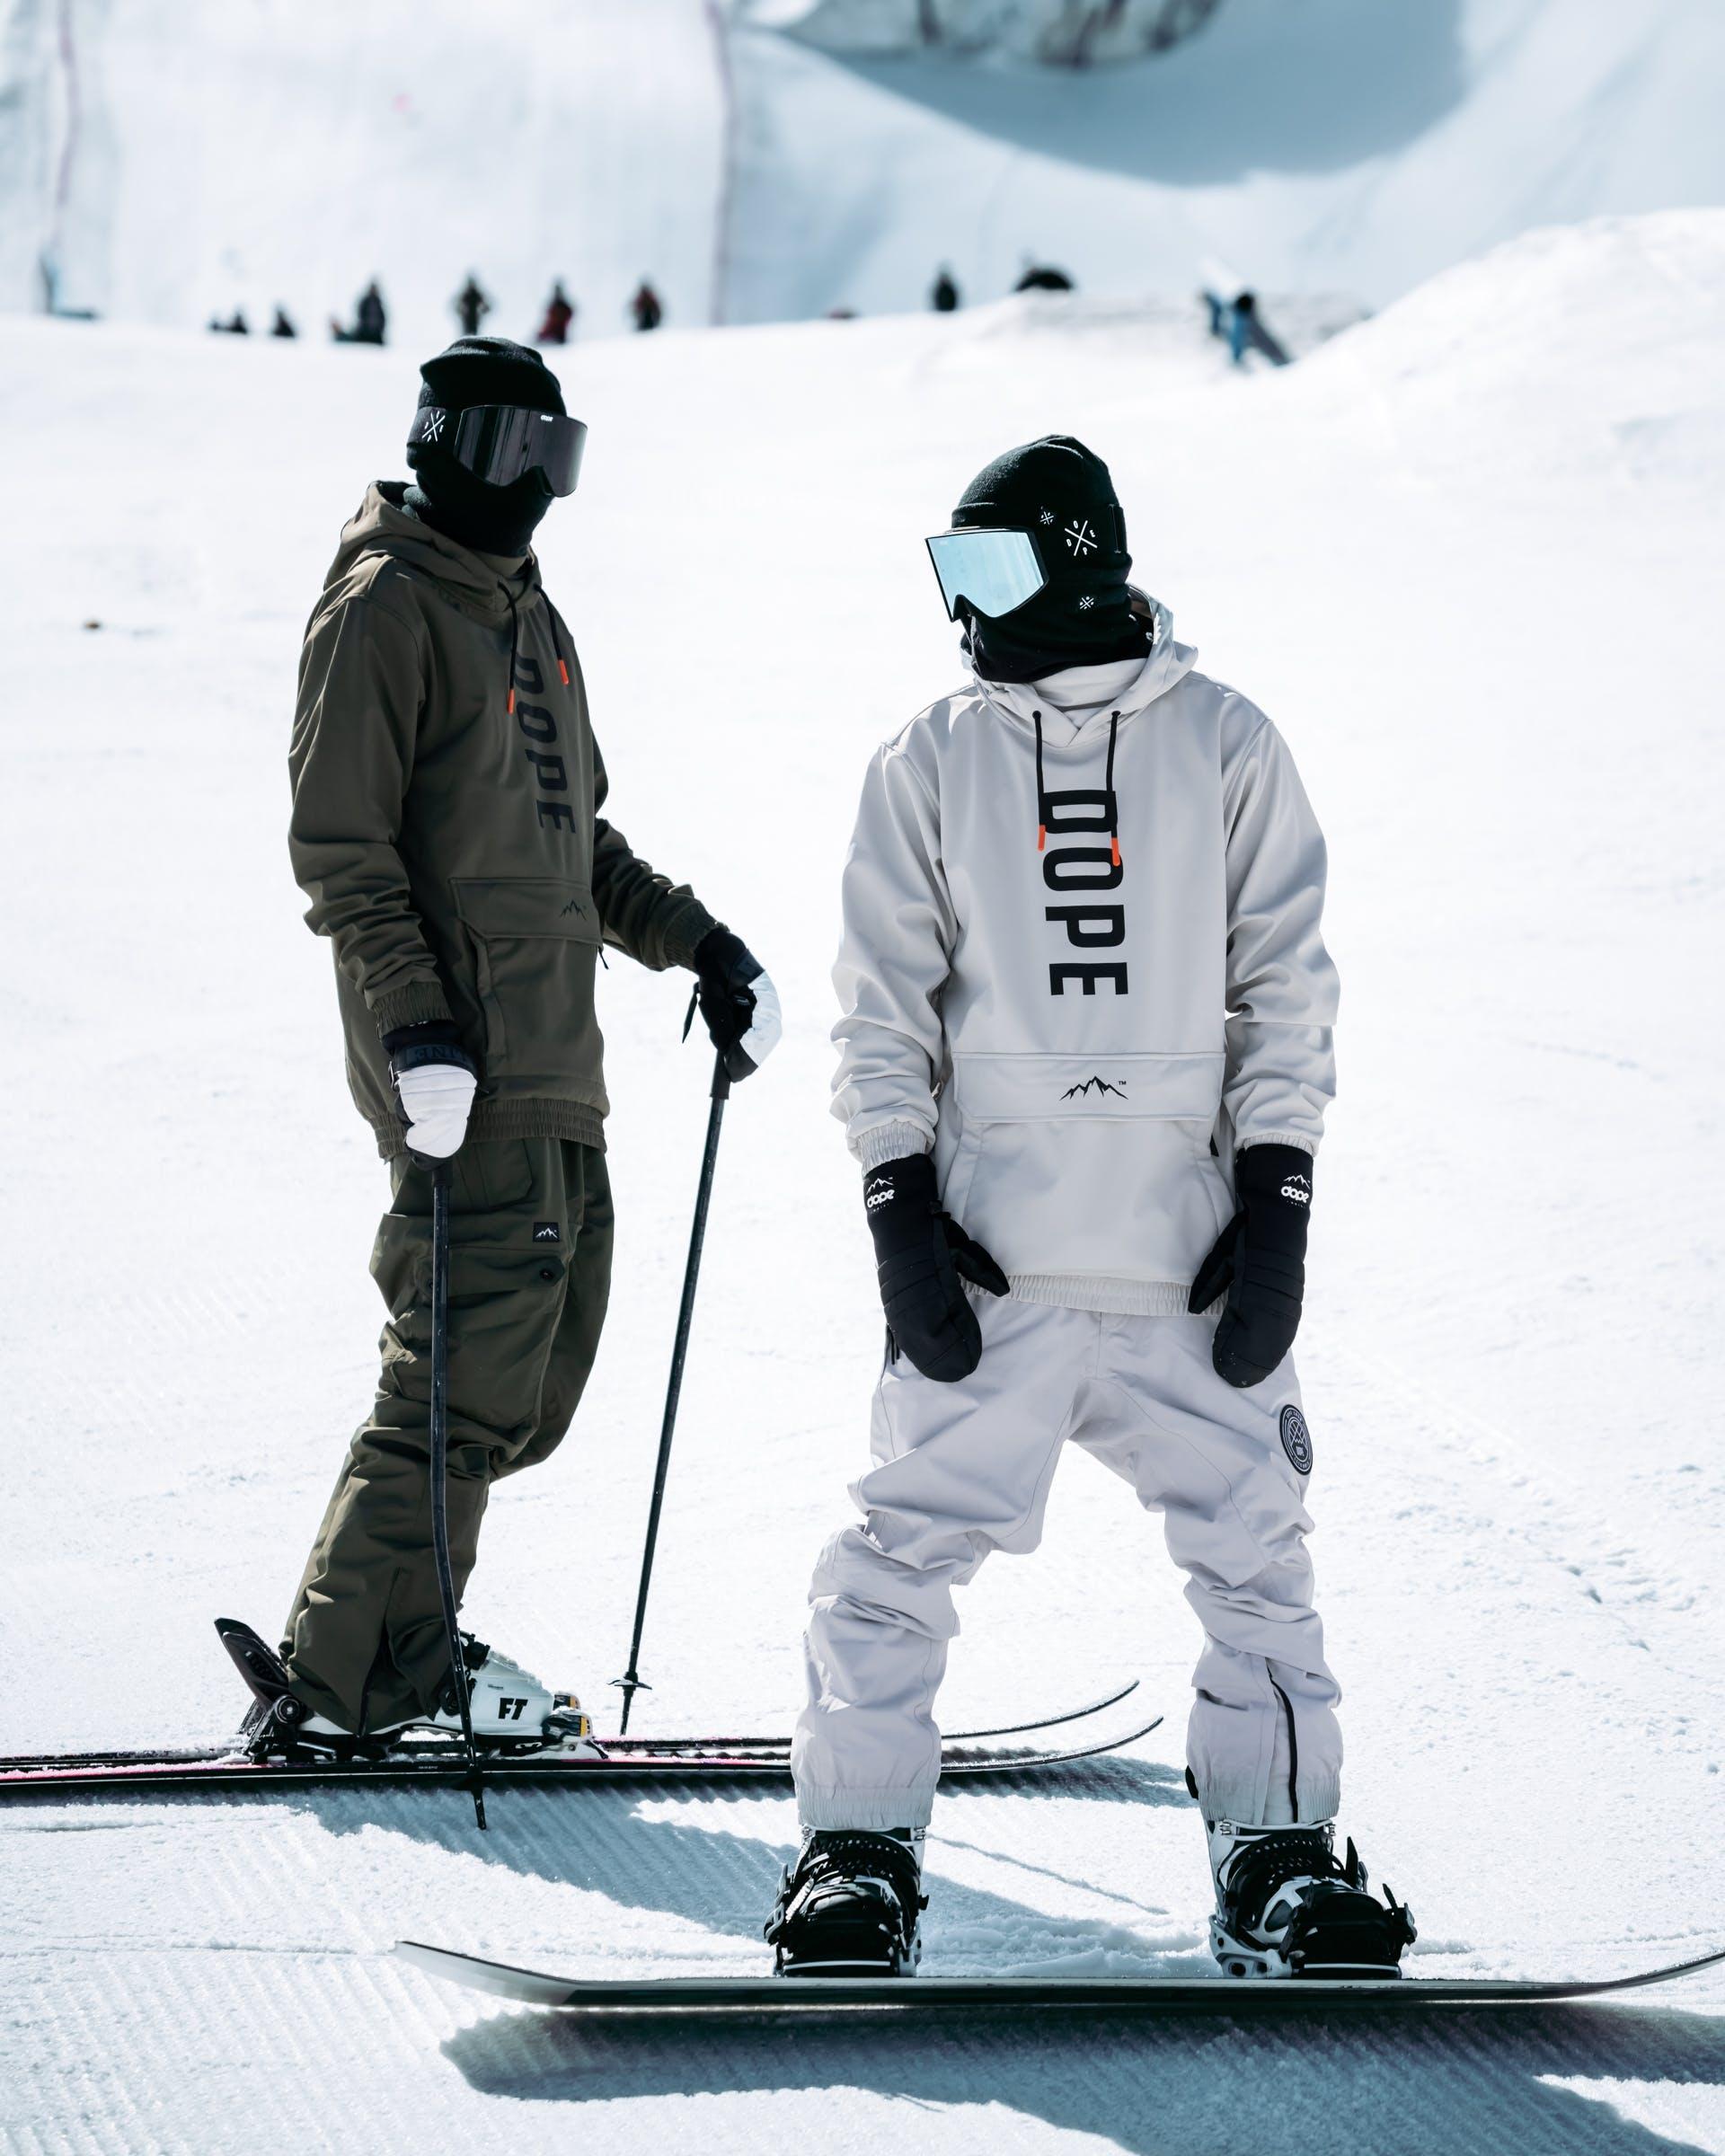 The origins of snowboarding